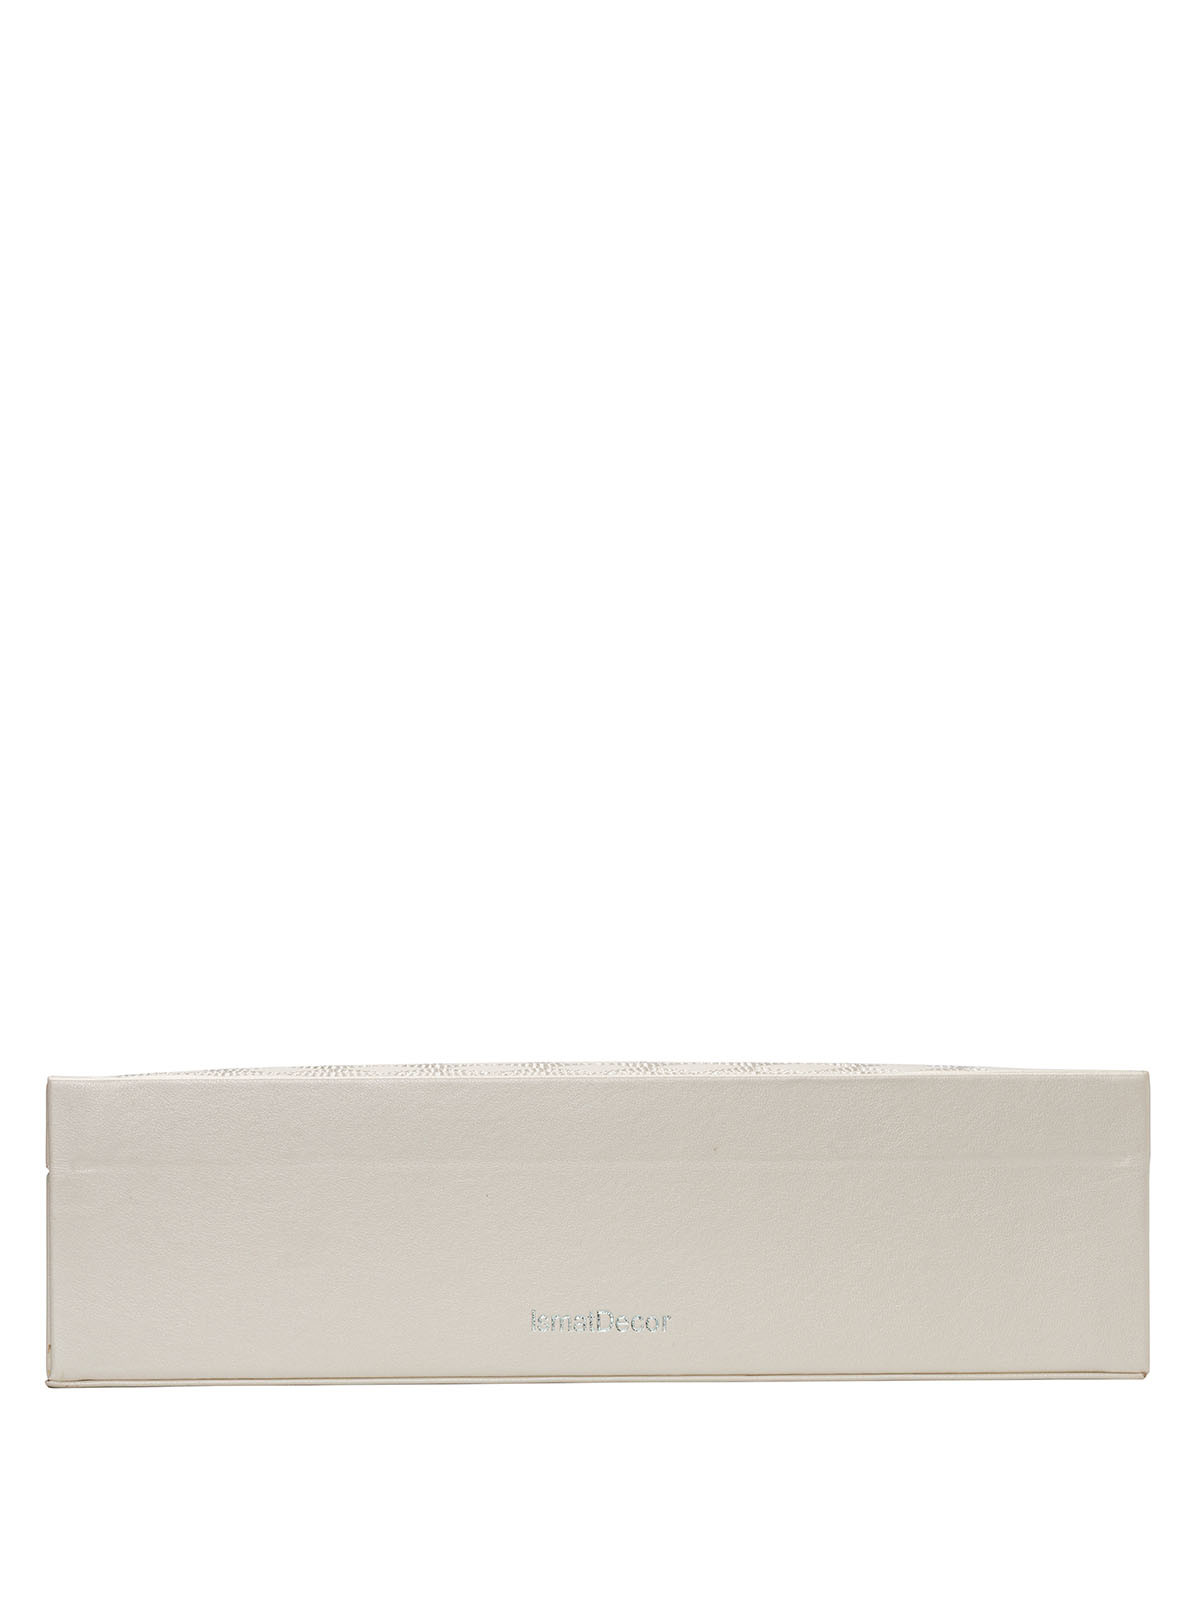 Шкатулка для украшений часов S-715W белый